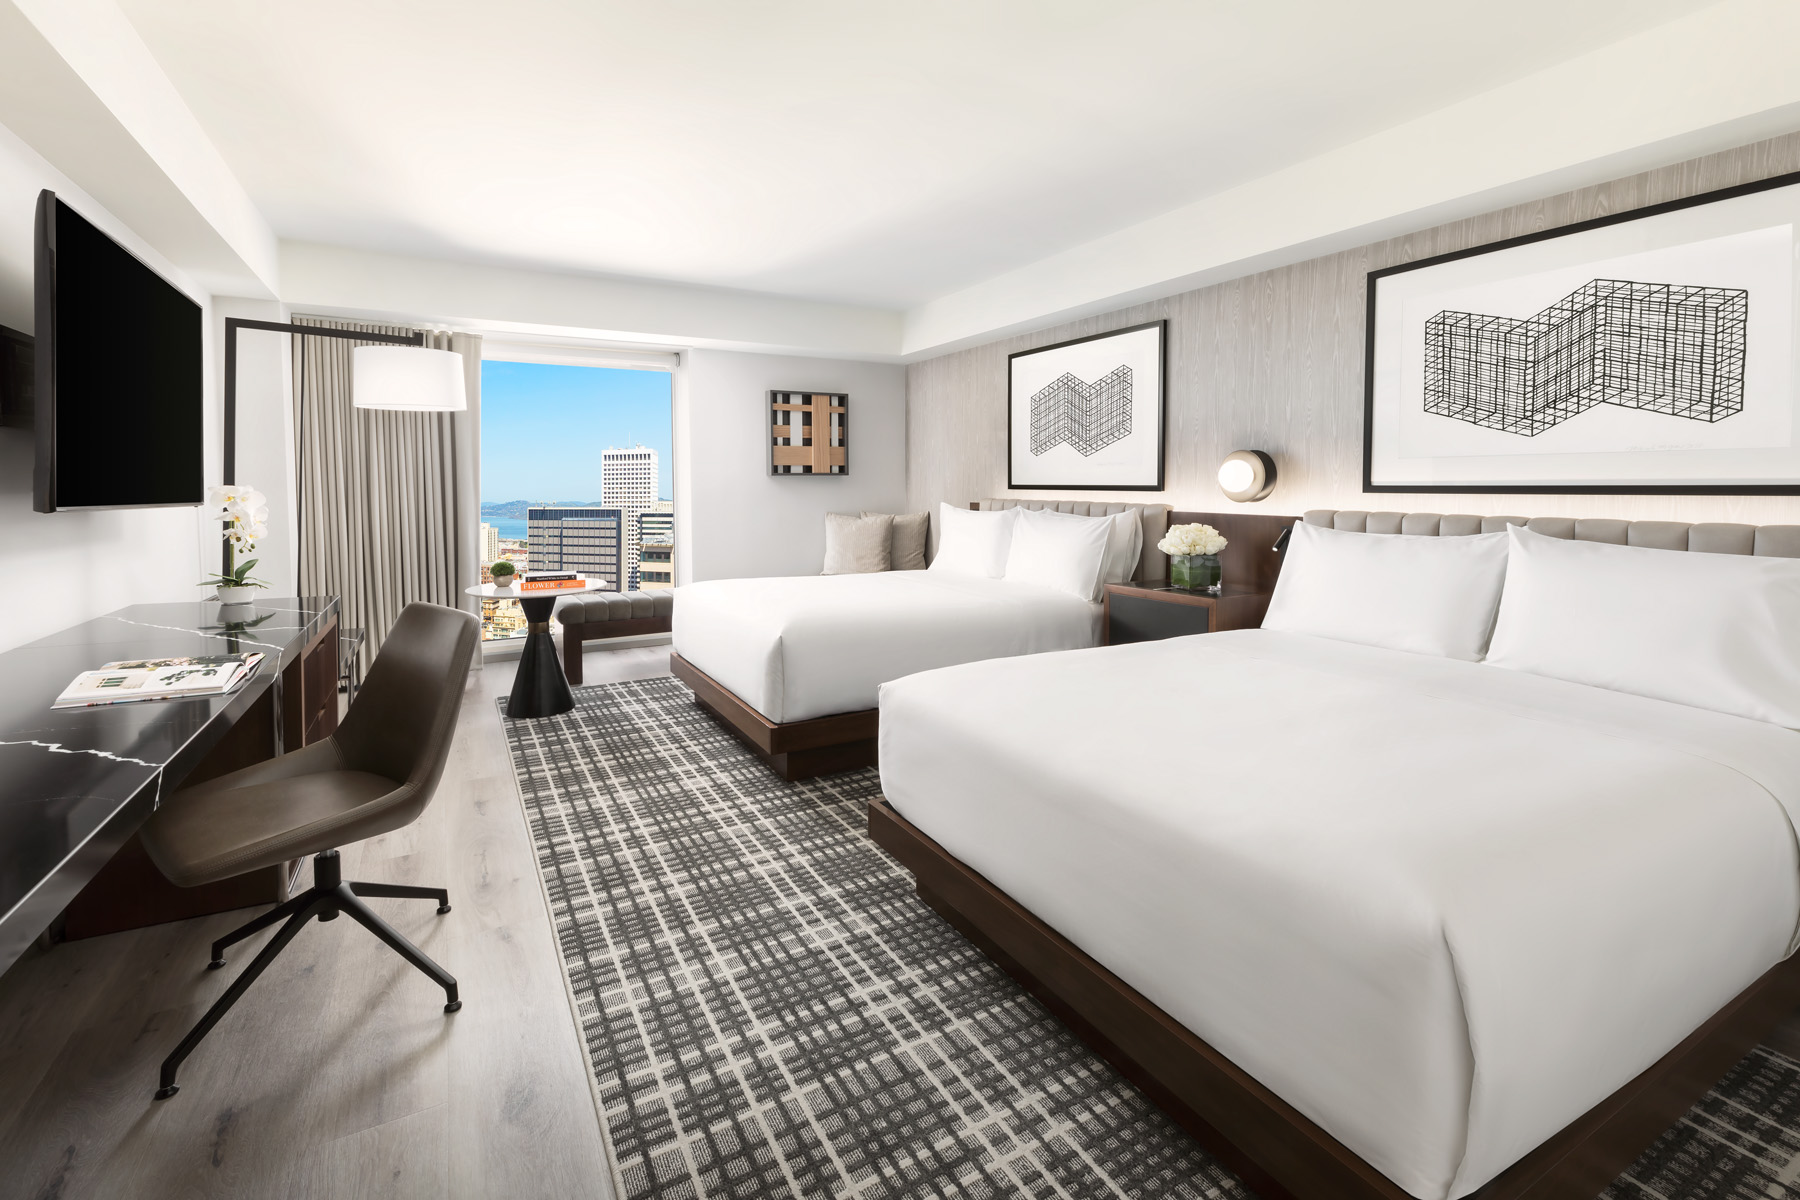 Hyatt Regency San Francisco Downtown SoMa Park Central Hotel BHDM Bay Area Morgan Stanley Highgate